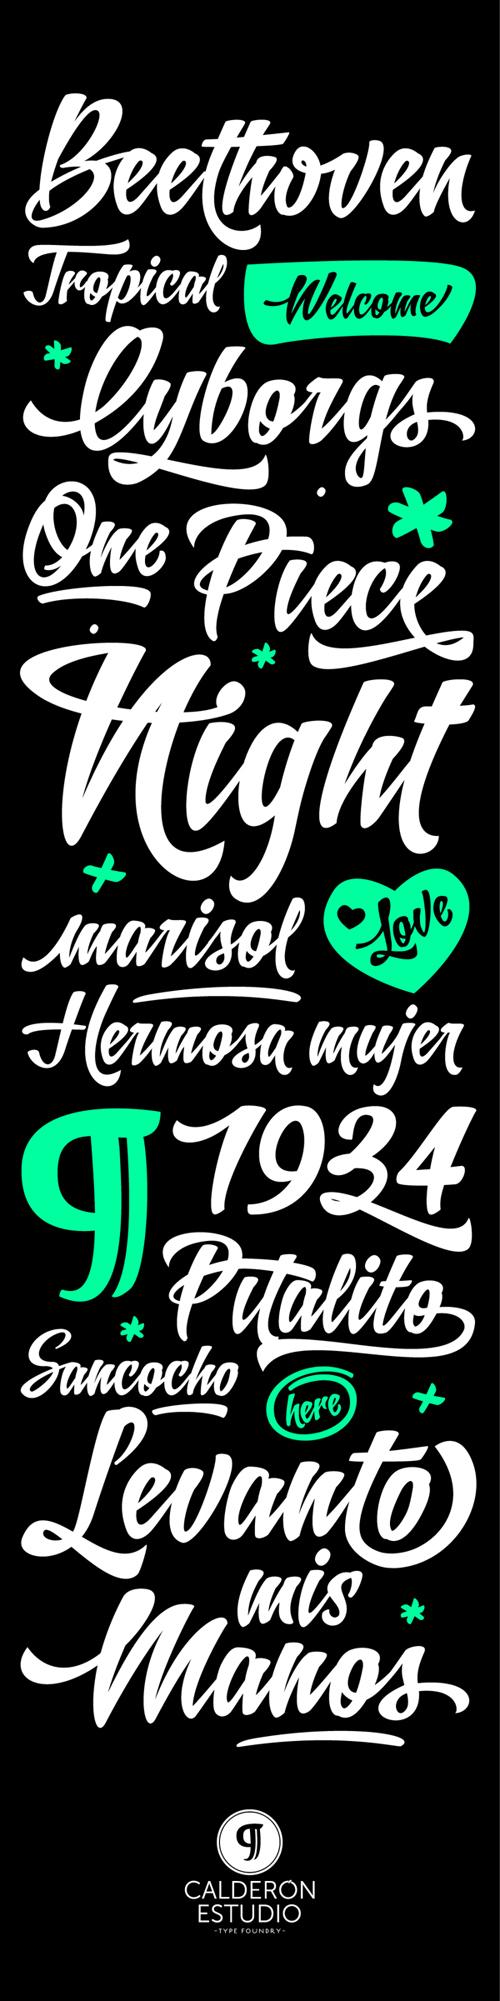 Beautiful Typography Design-17